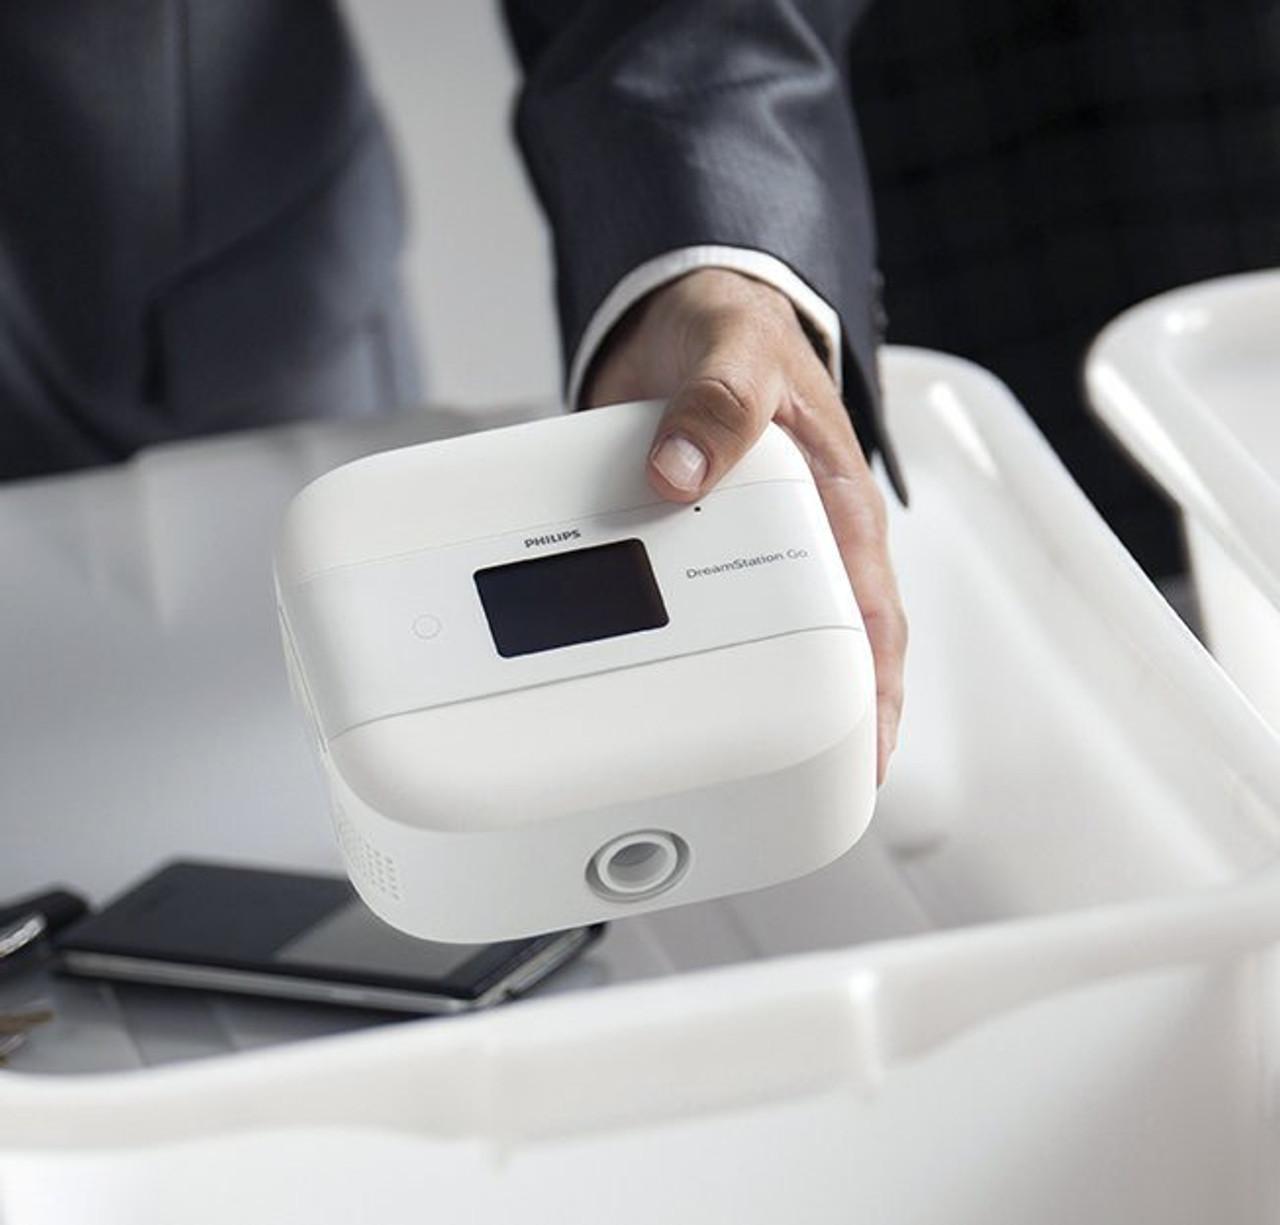 DreamStation Go Auto Travel CPAP Machine w/ Bluetooth